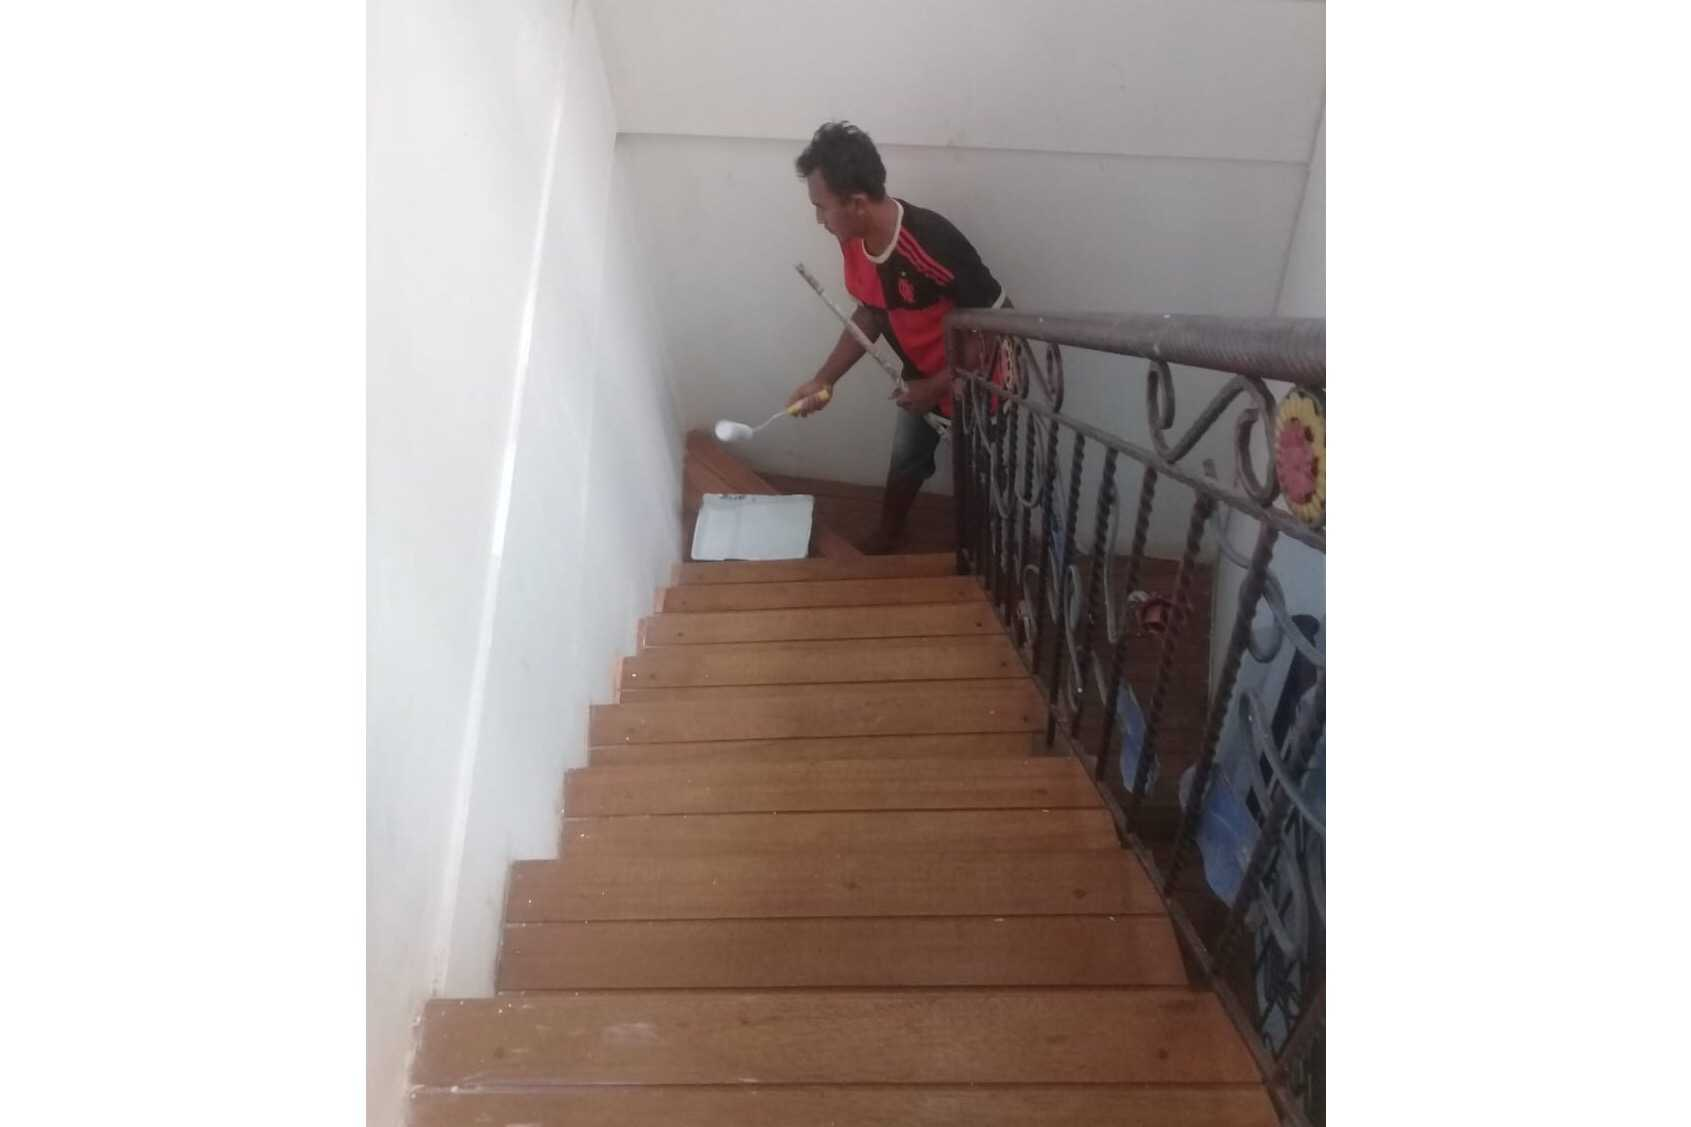 Cipta Bangun Pratama Renovasi Rumah Di Jakarta Cibinong, Bogor, Jawa Barat, Indonesia Cibinong, Bogor, Jawa Barat, Indonesia Cipta-Bangun-Pratama-Renovasi-Rumah-Di-Jakarta  74715